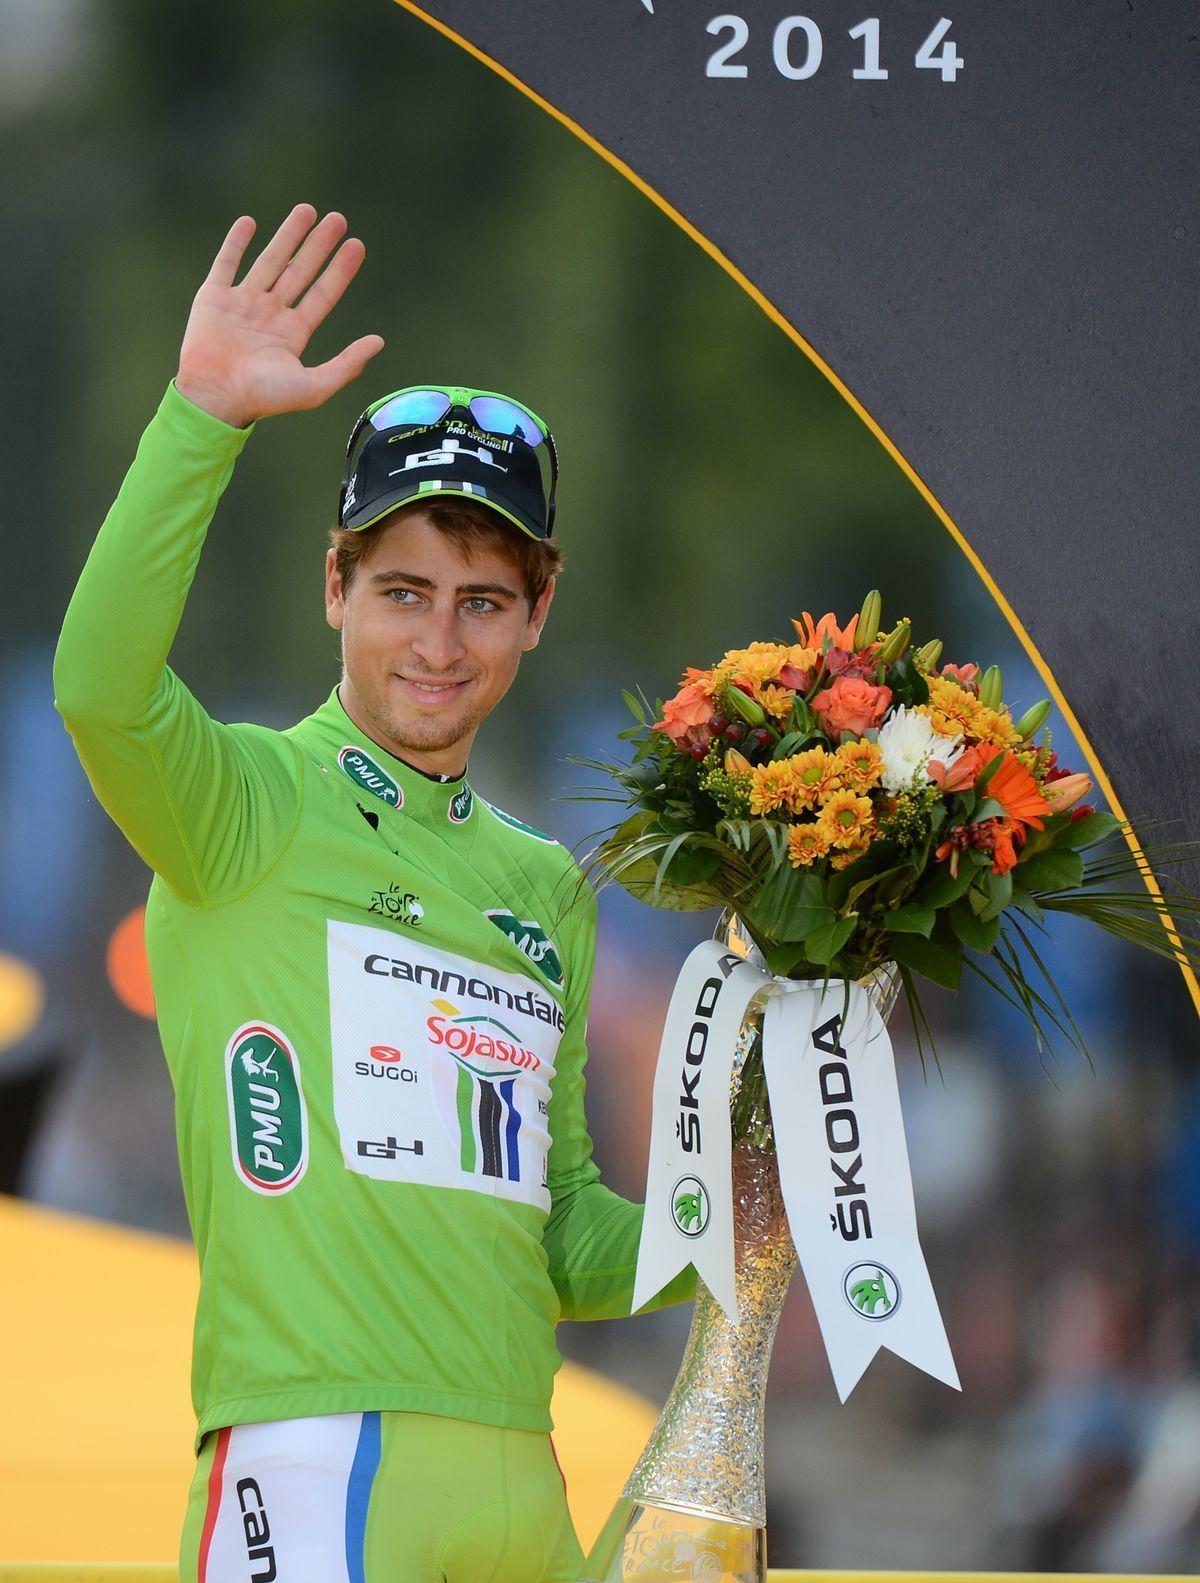 c26928a737f4f Peter Sagan bude na Tour de France 2015 obhajovať zelené tričko ...